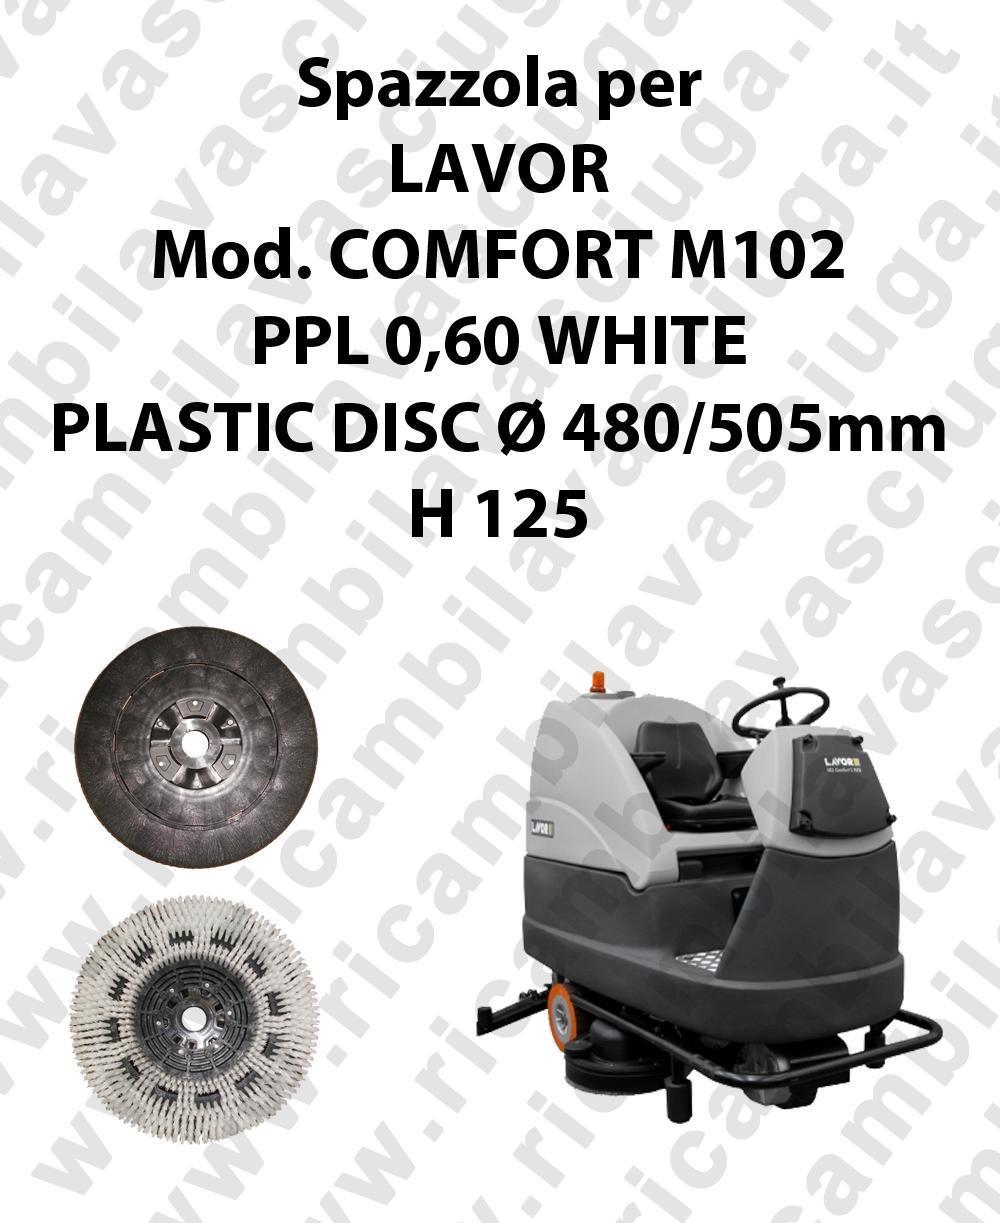 CEPILLO DE LAVADO PPL 0,60 WHITE para fregadora LAVOR modelo COMFORT M102